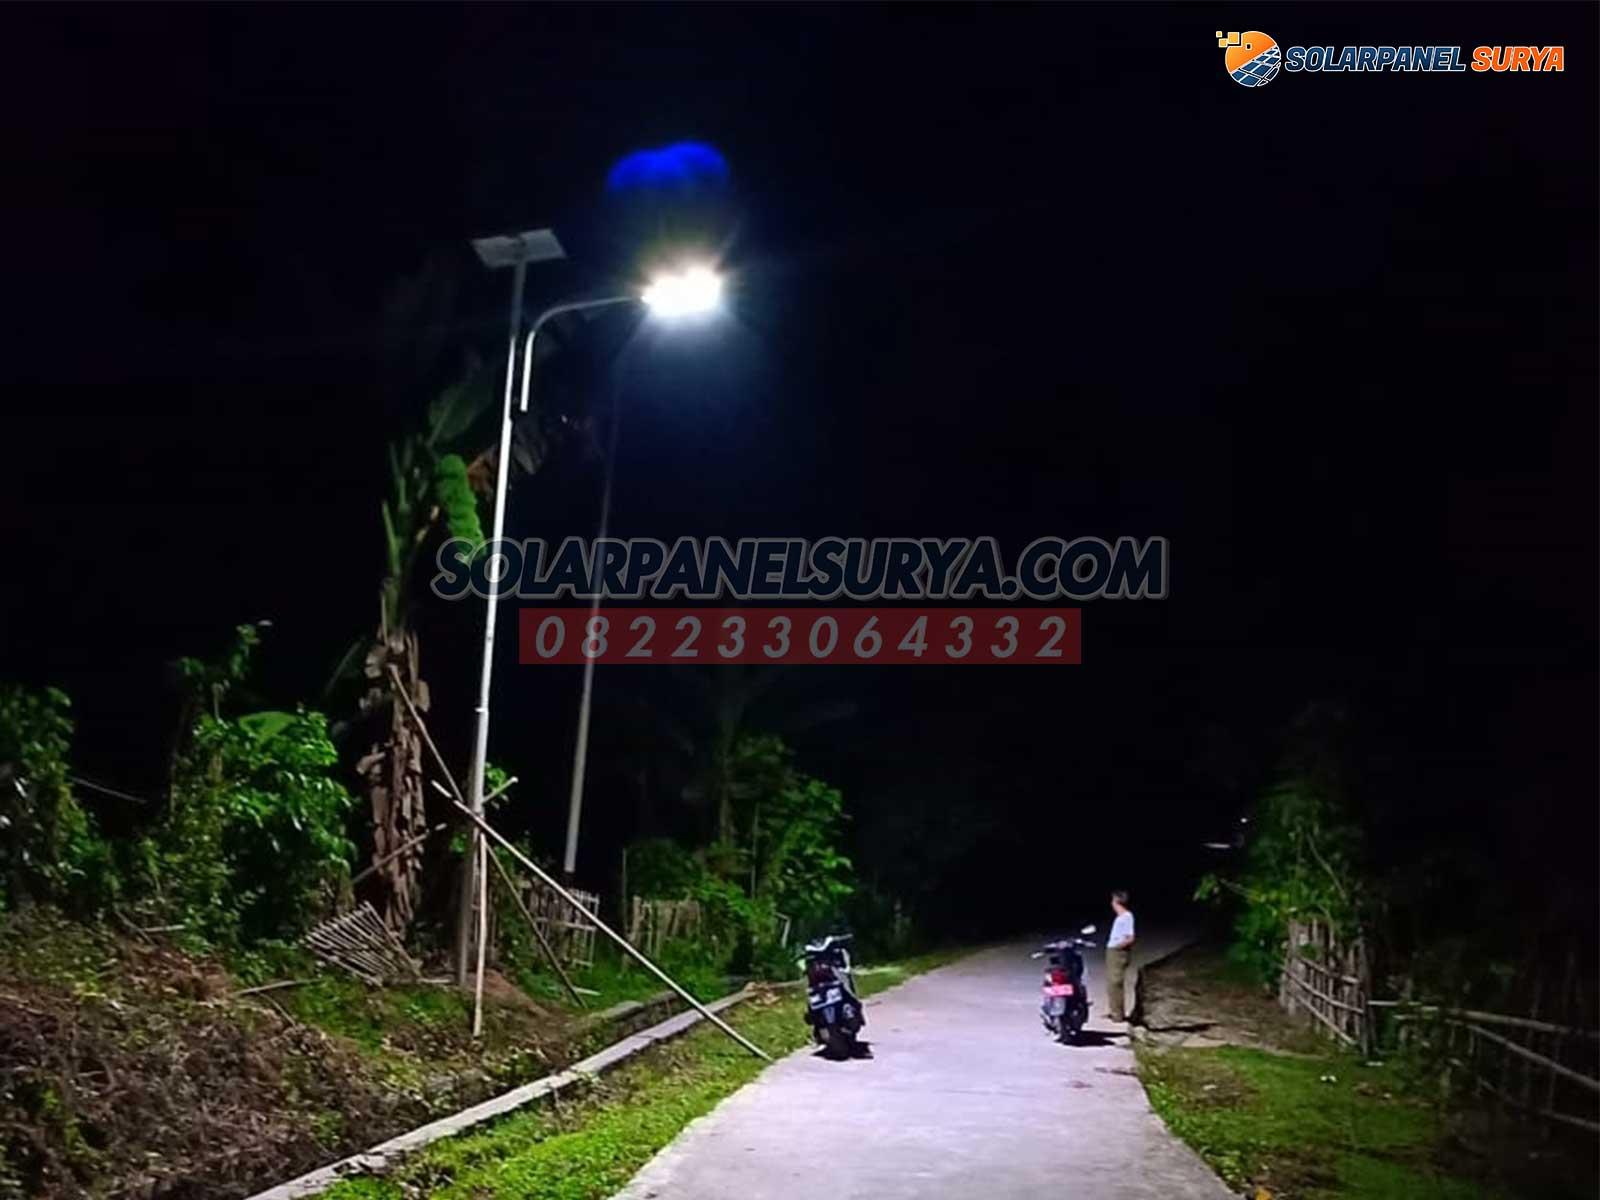 lampu PJUTS Solar Cell 2in1 80 watt